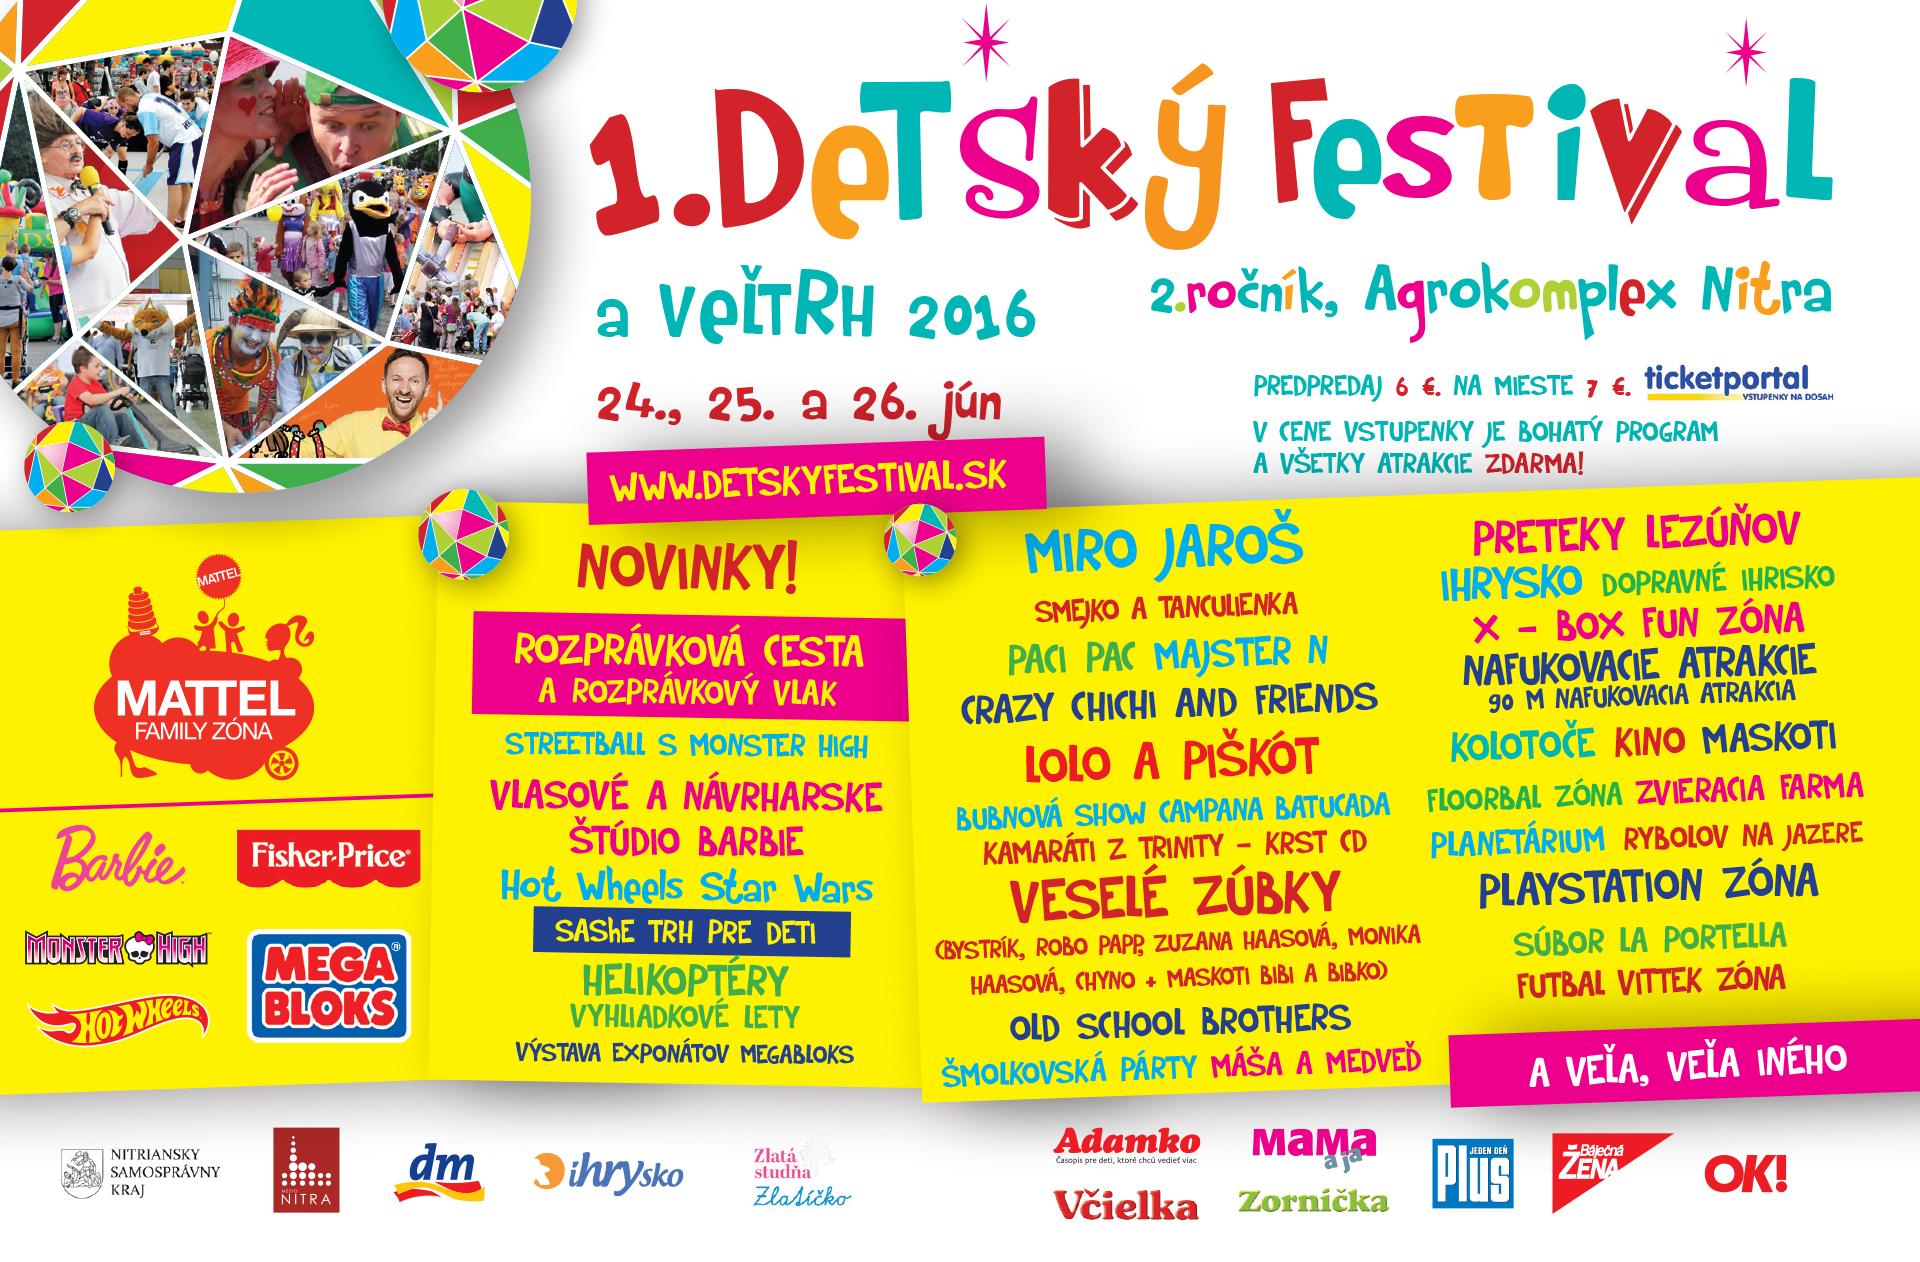 Detsky-festival-web